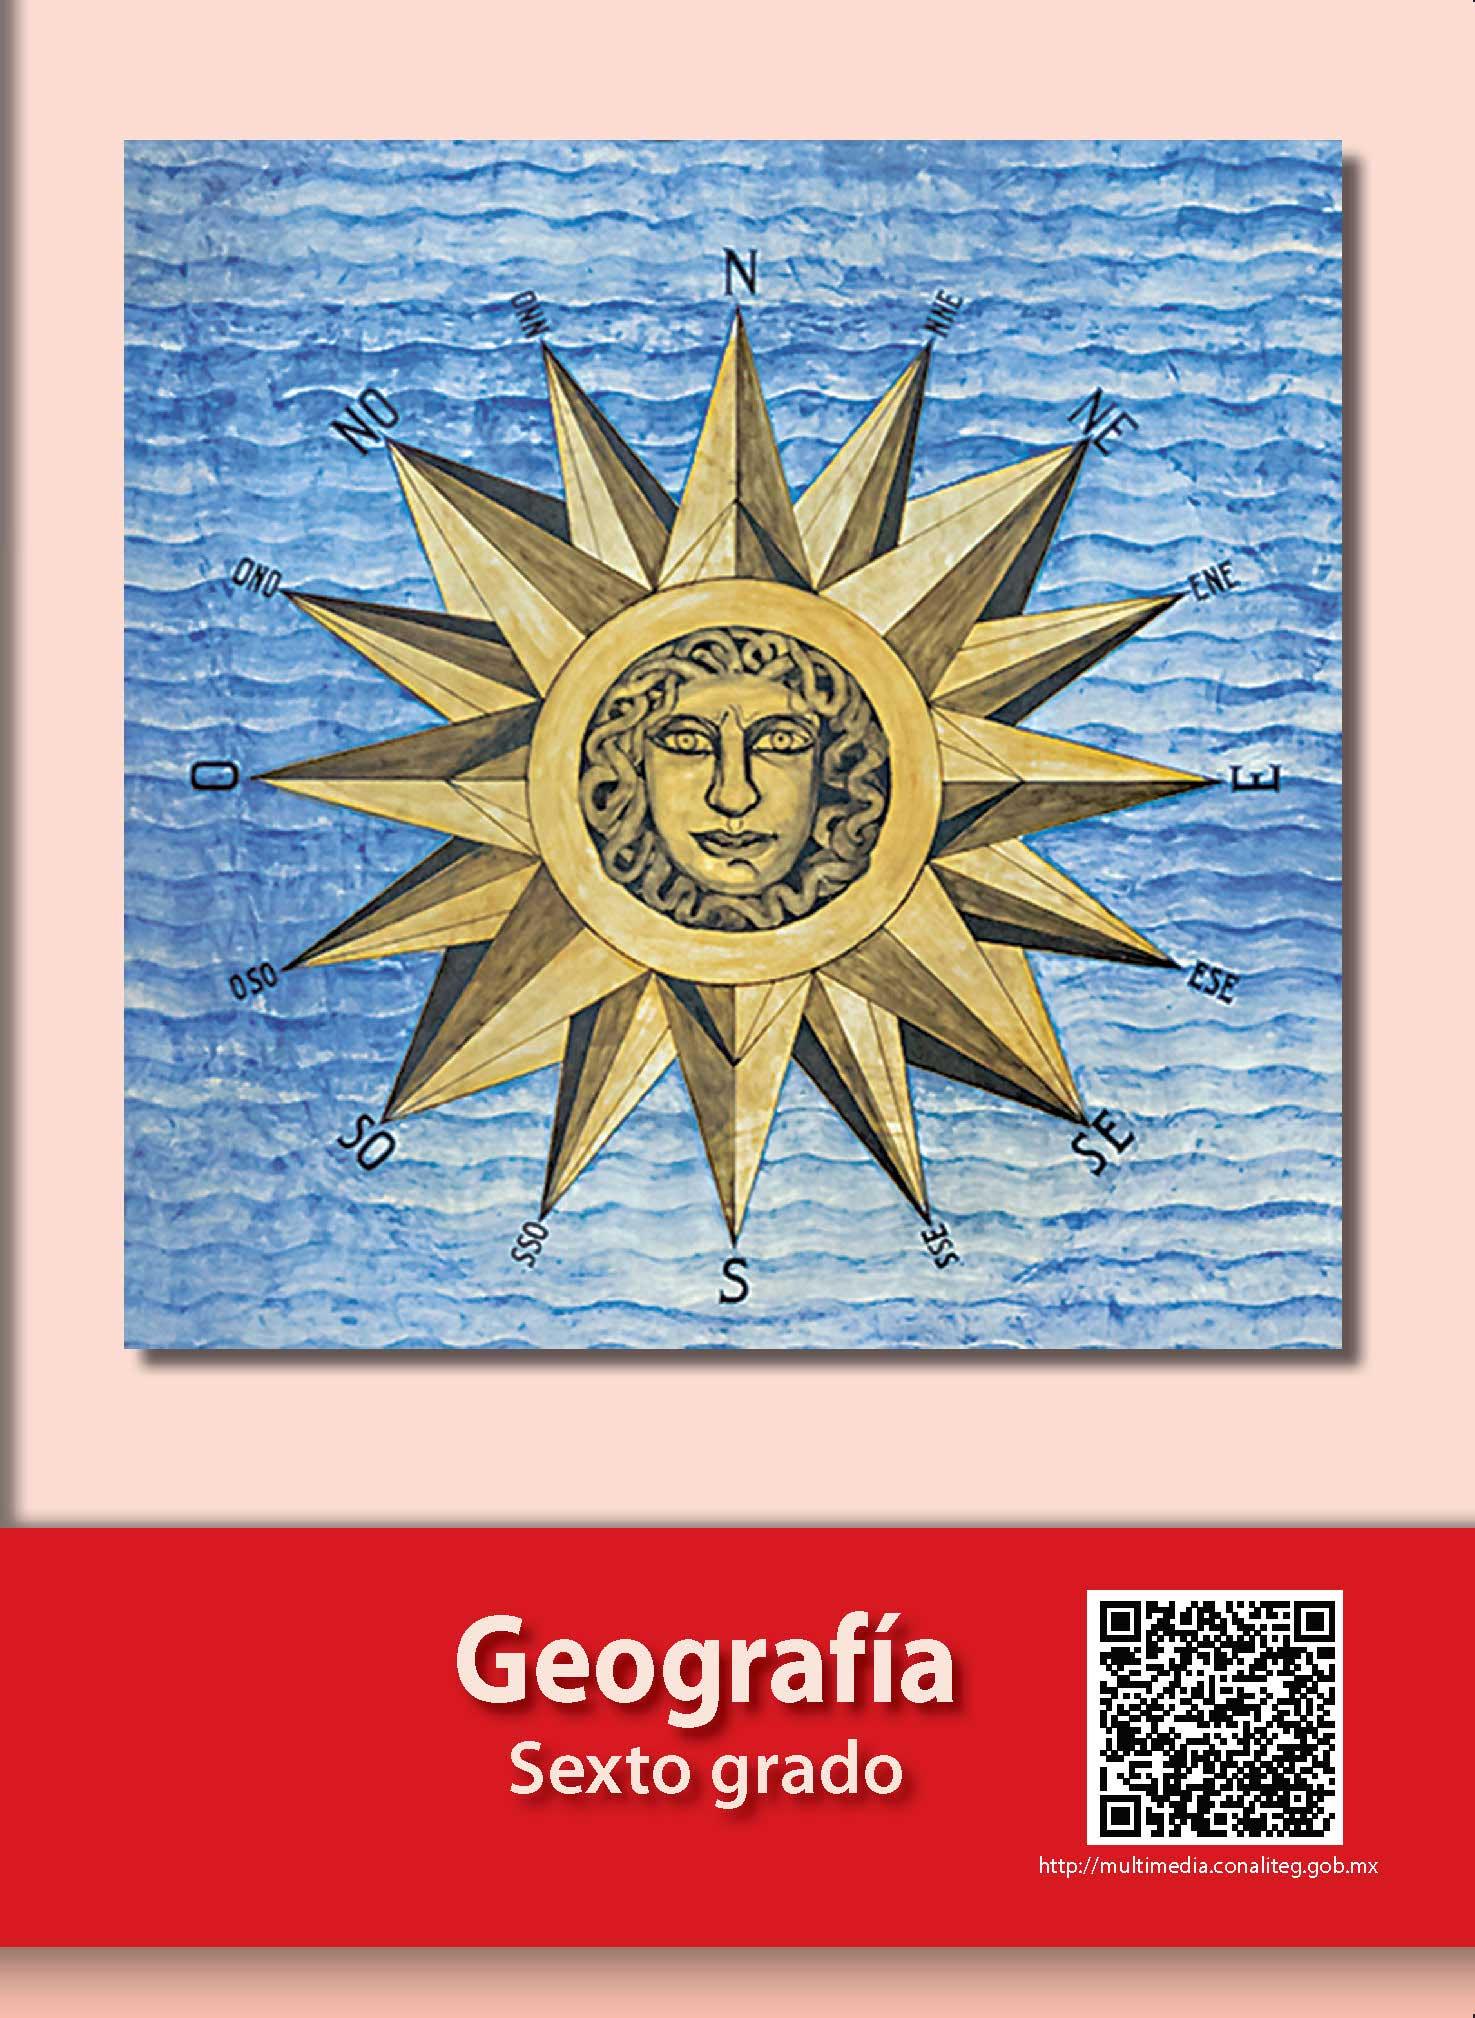 Libro De Geografia De 6 Grado Del 2019 – Justgoing 2020 @tataya.com.mx 2021